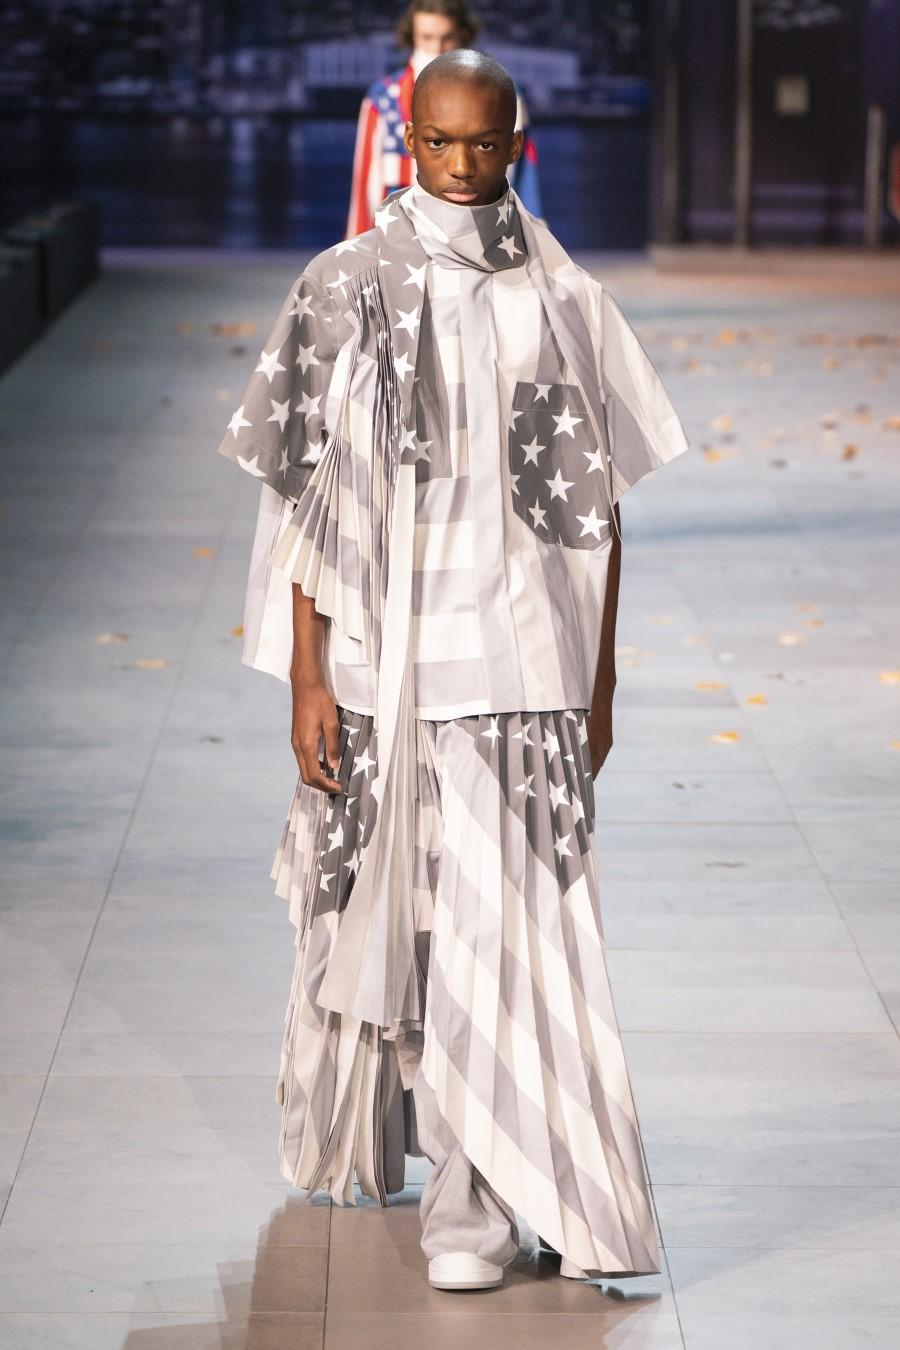 Louis Vuitton Men's Fall Winter 2019 - Paris Fashion Week